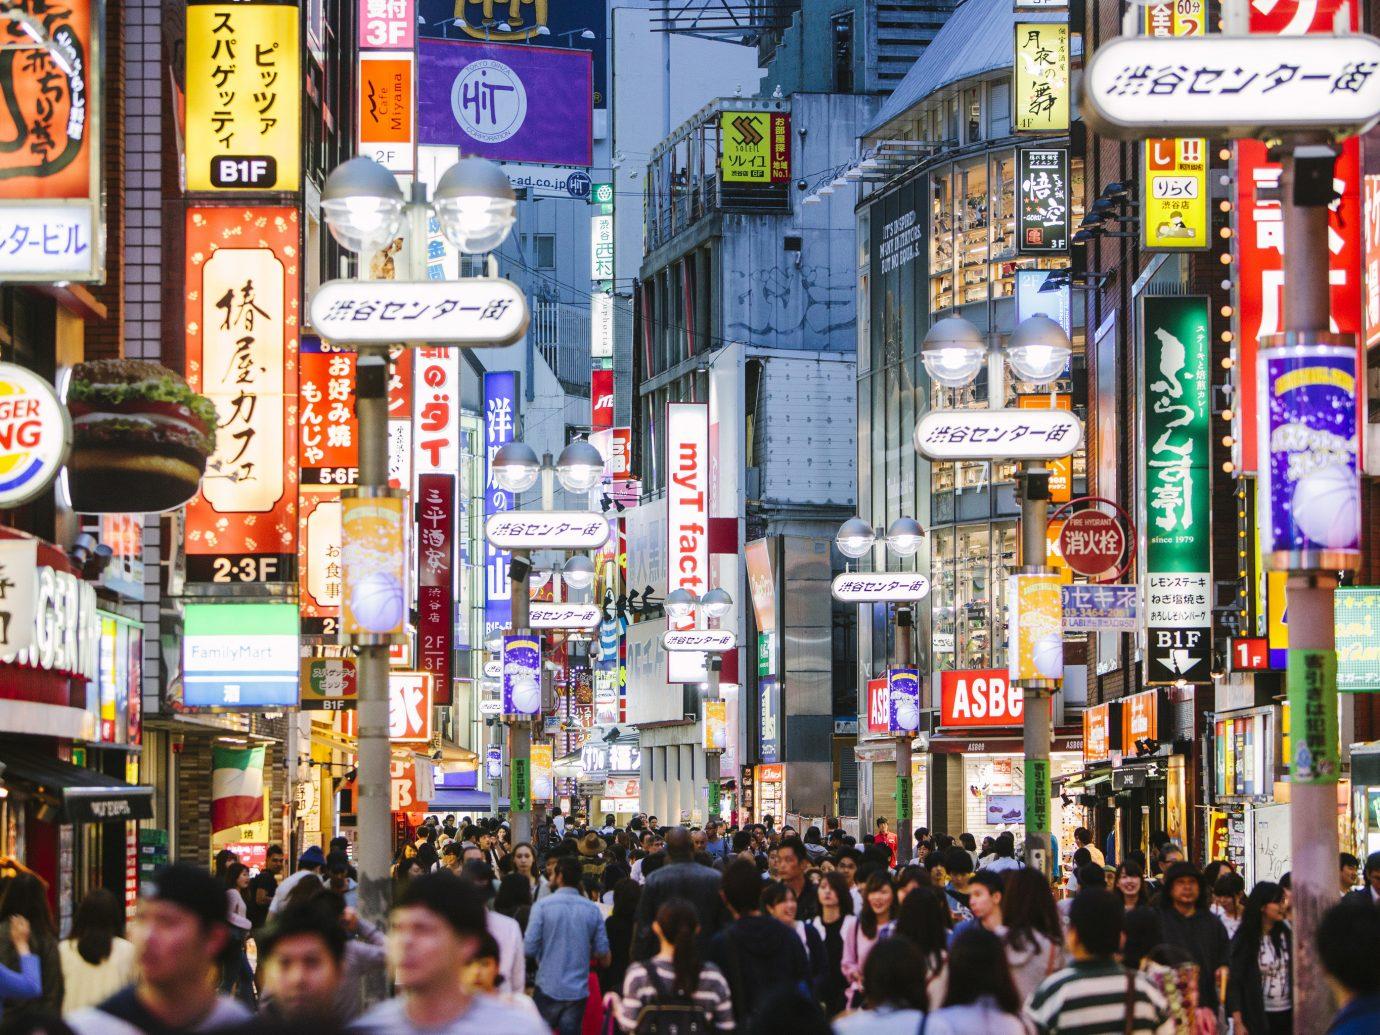 Trip Ideas outdoor street person urban area City metropolis walking metropolitan area shopping people pedestrian crowd market night busy